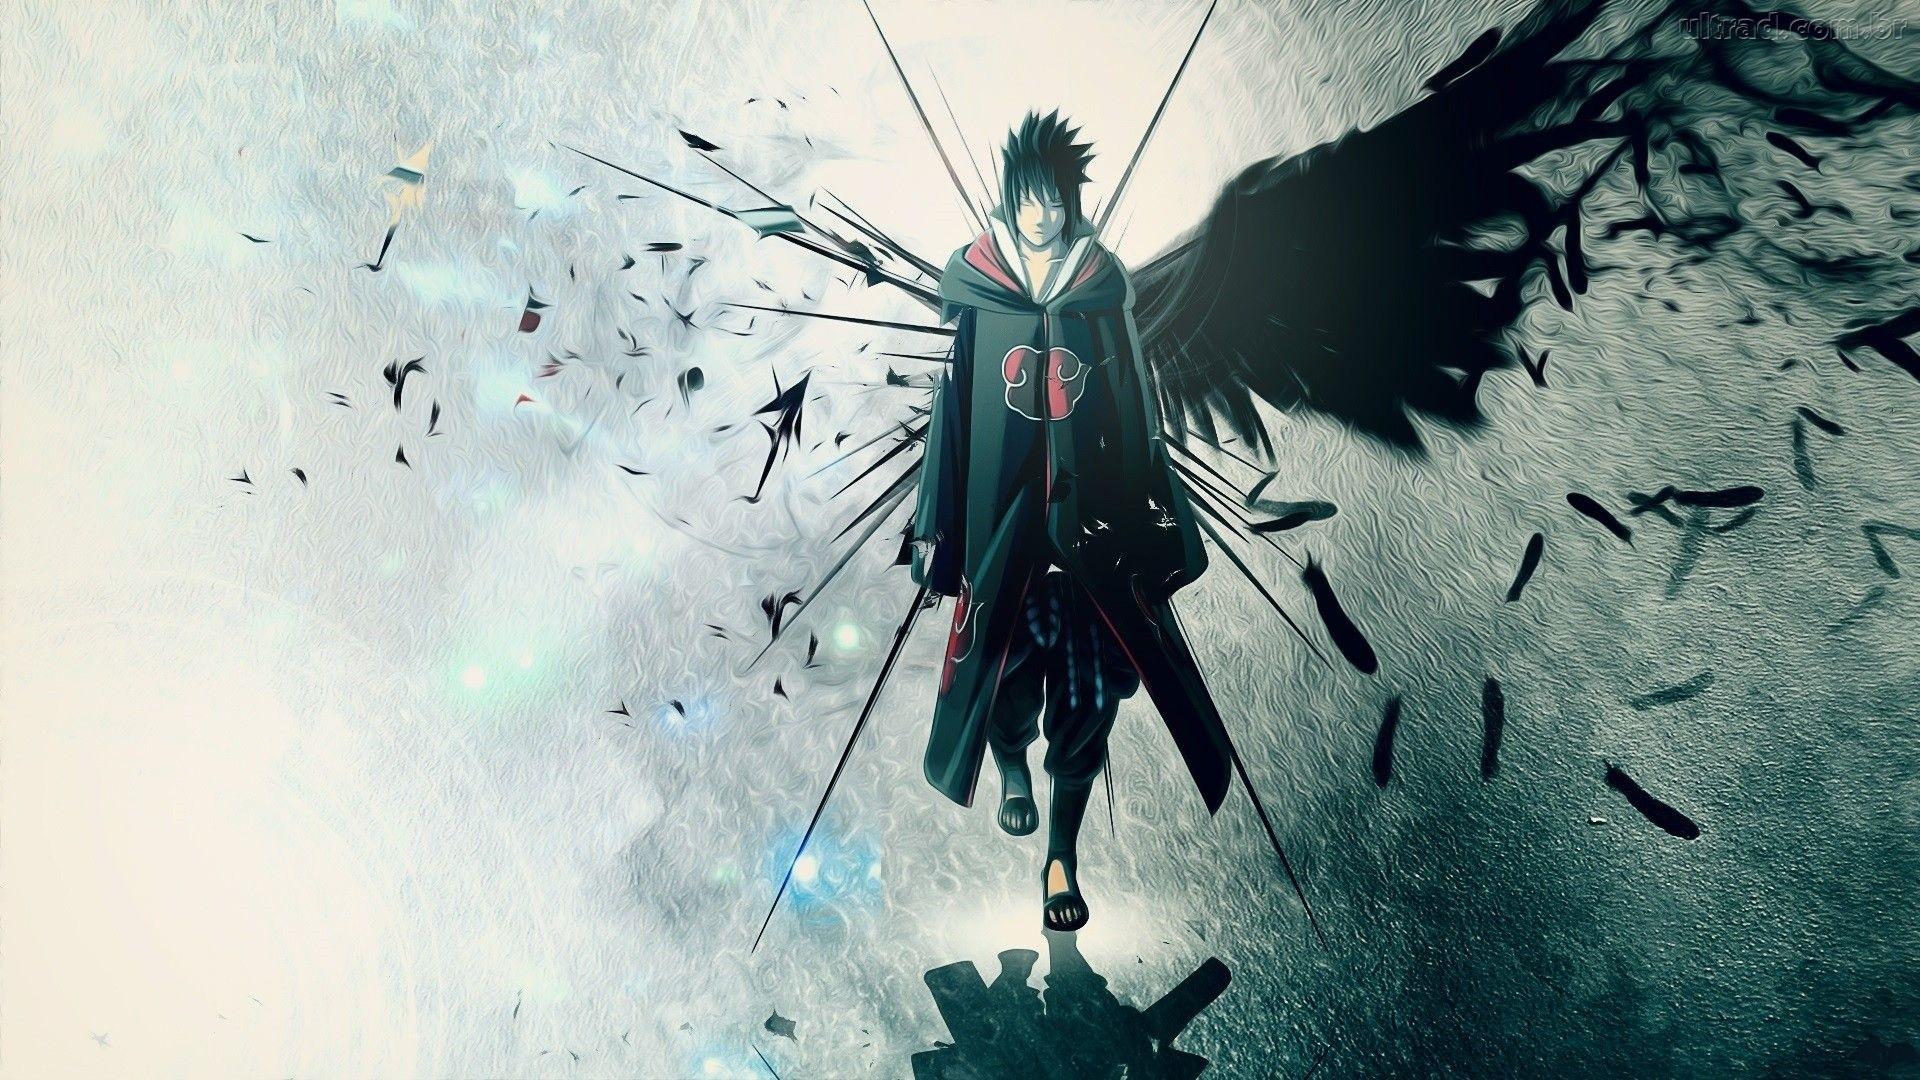 Explore Sasuke Uchiha, Hd Wallpaper, and more!